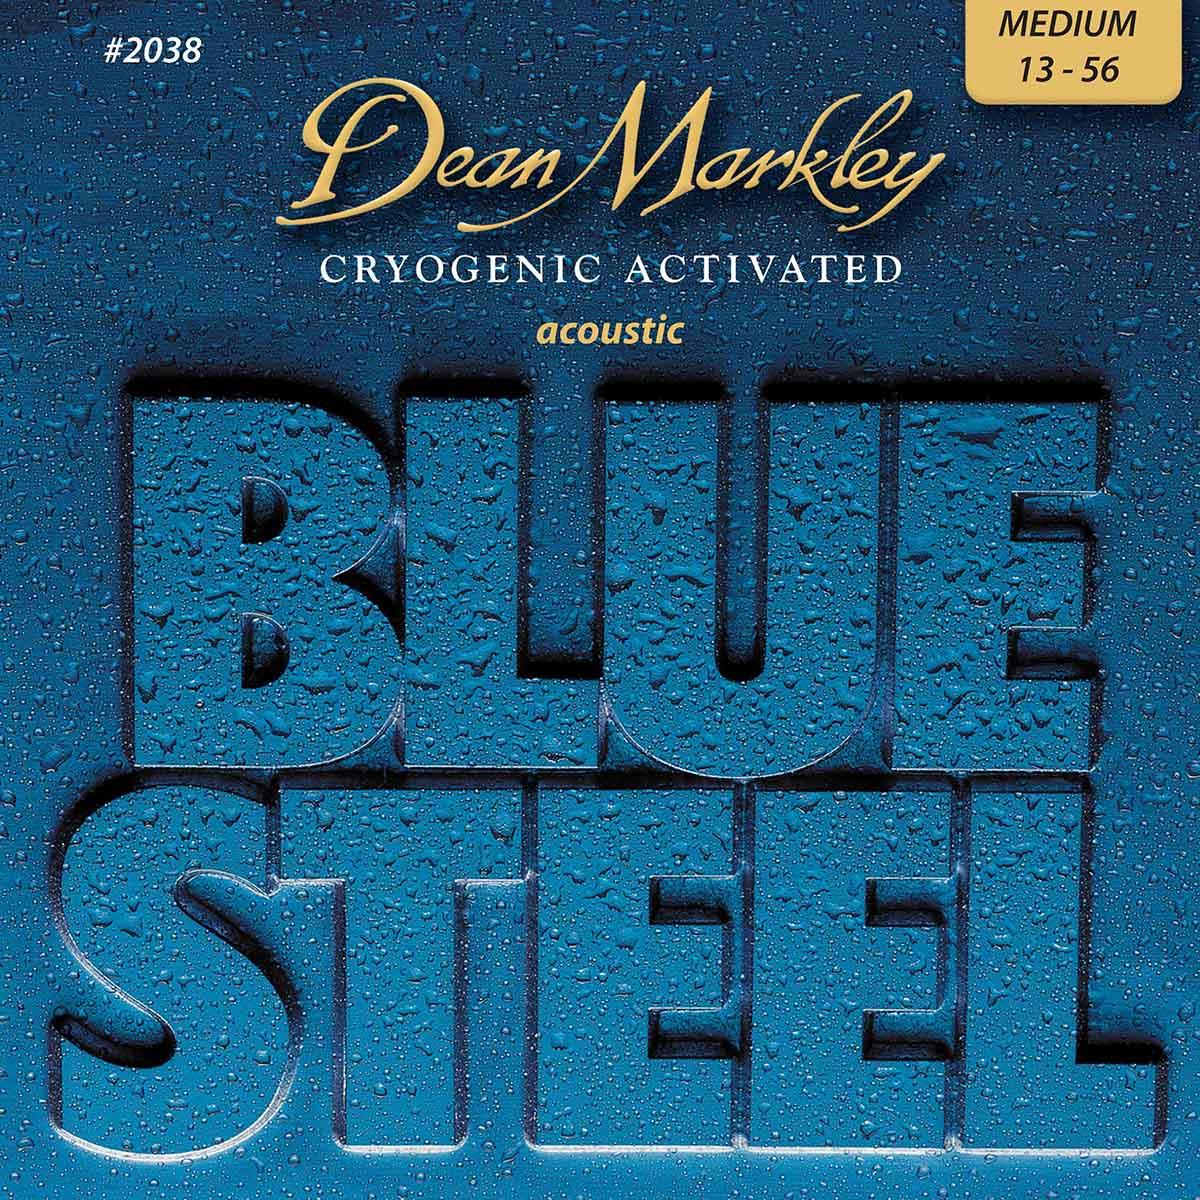 ENCORDOAMENTO P/ VIOLÂO BLUE STEEL 13-56 2038 - DEAN MARKLEY